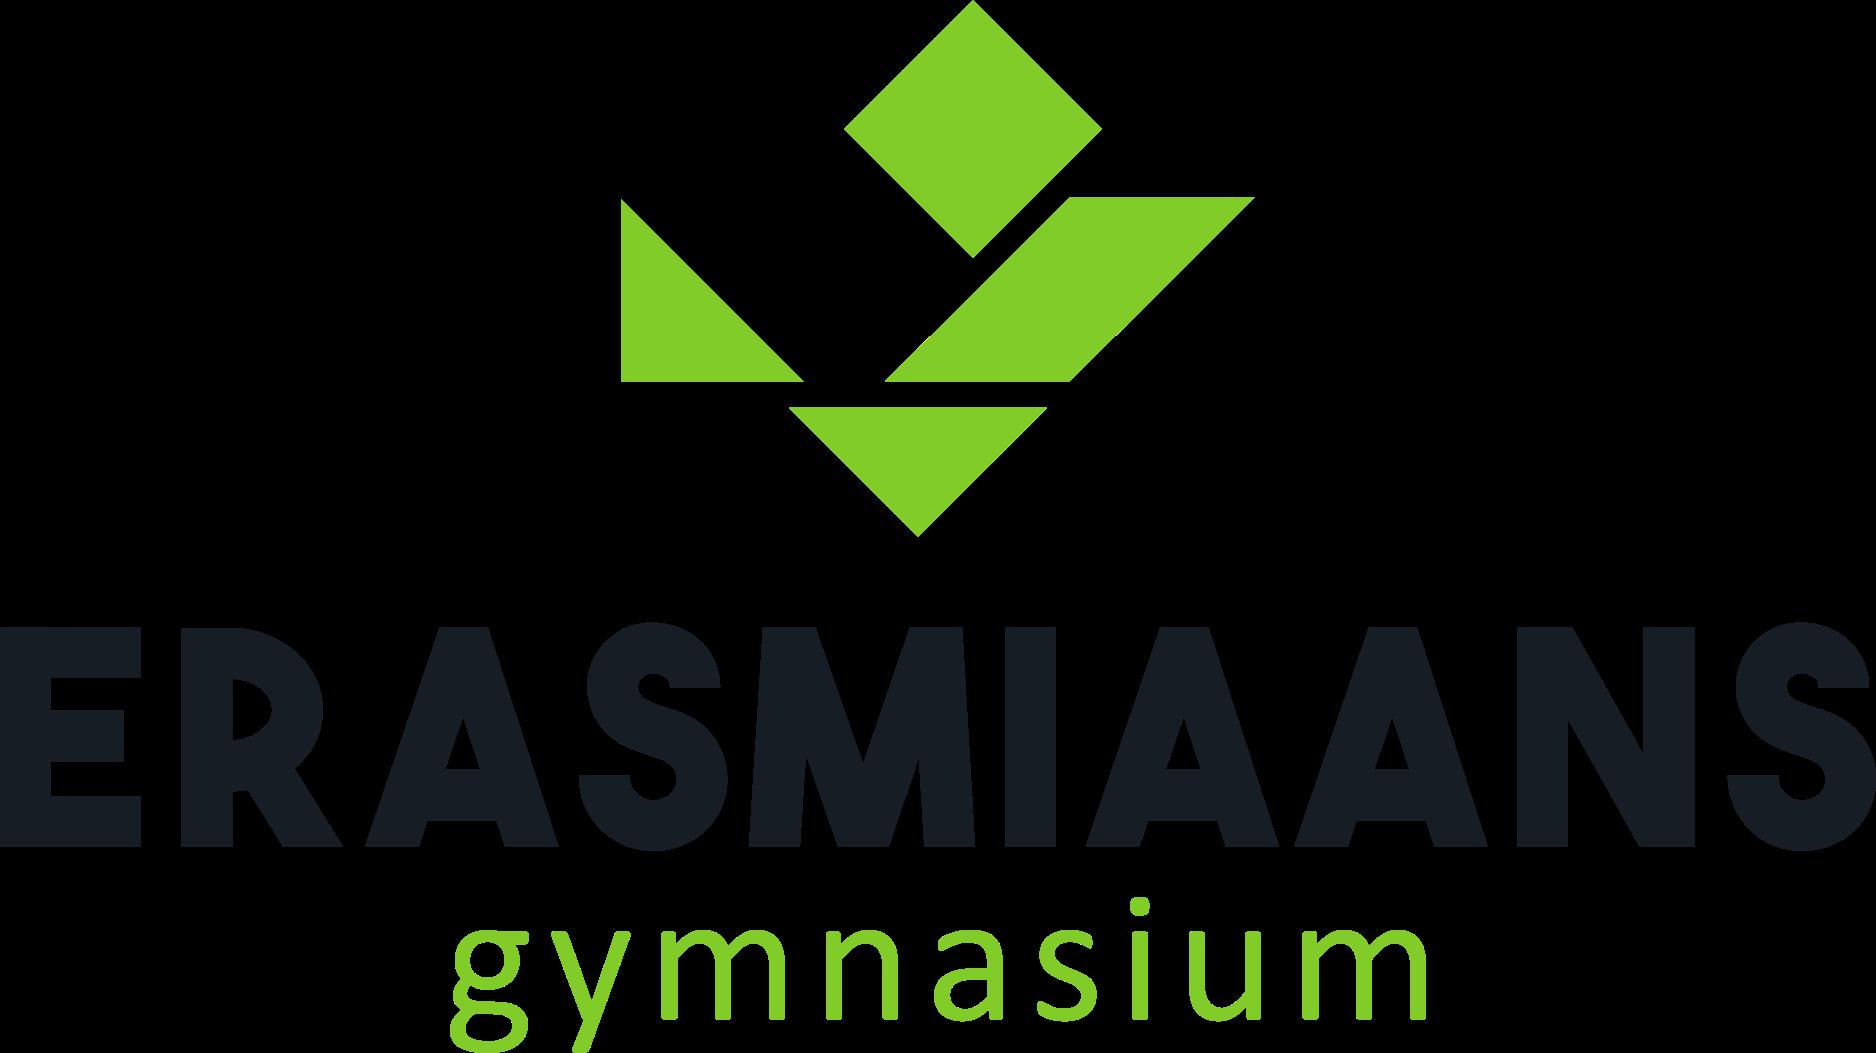 Erasmiaans Gymnasium logo